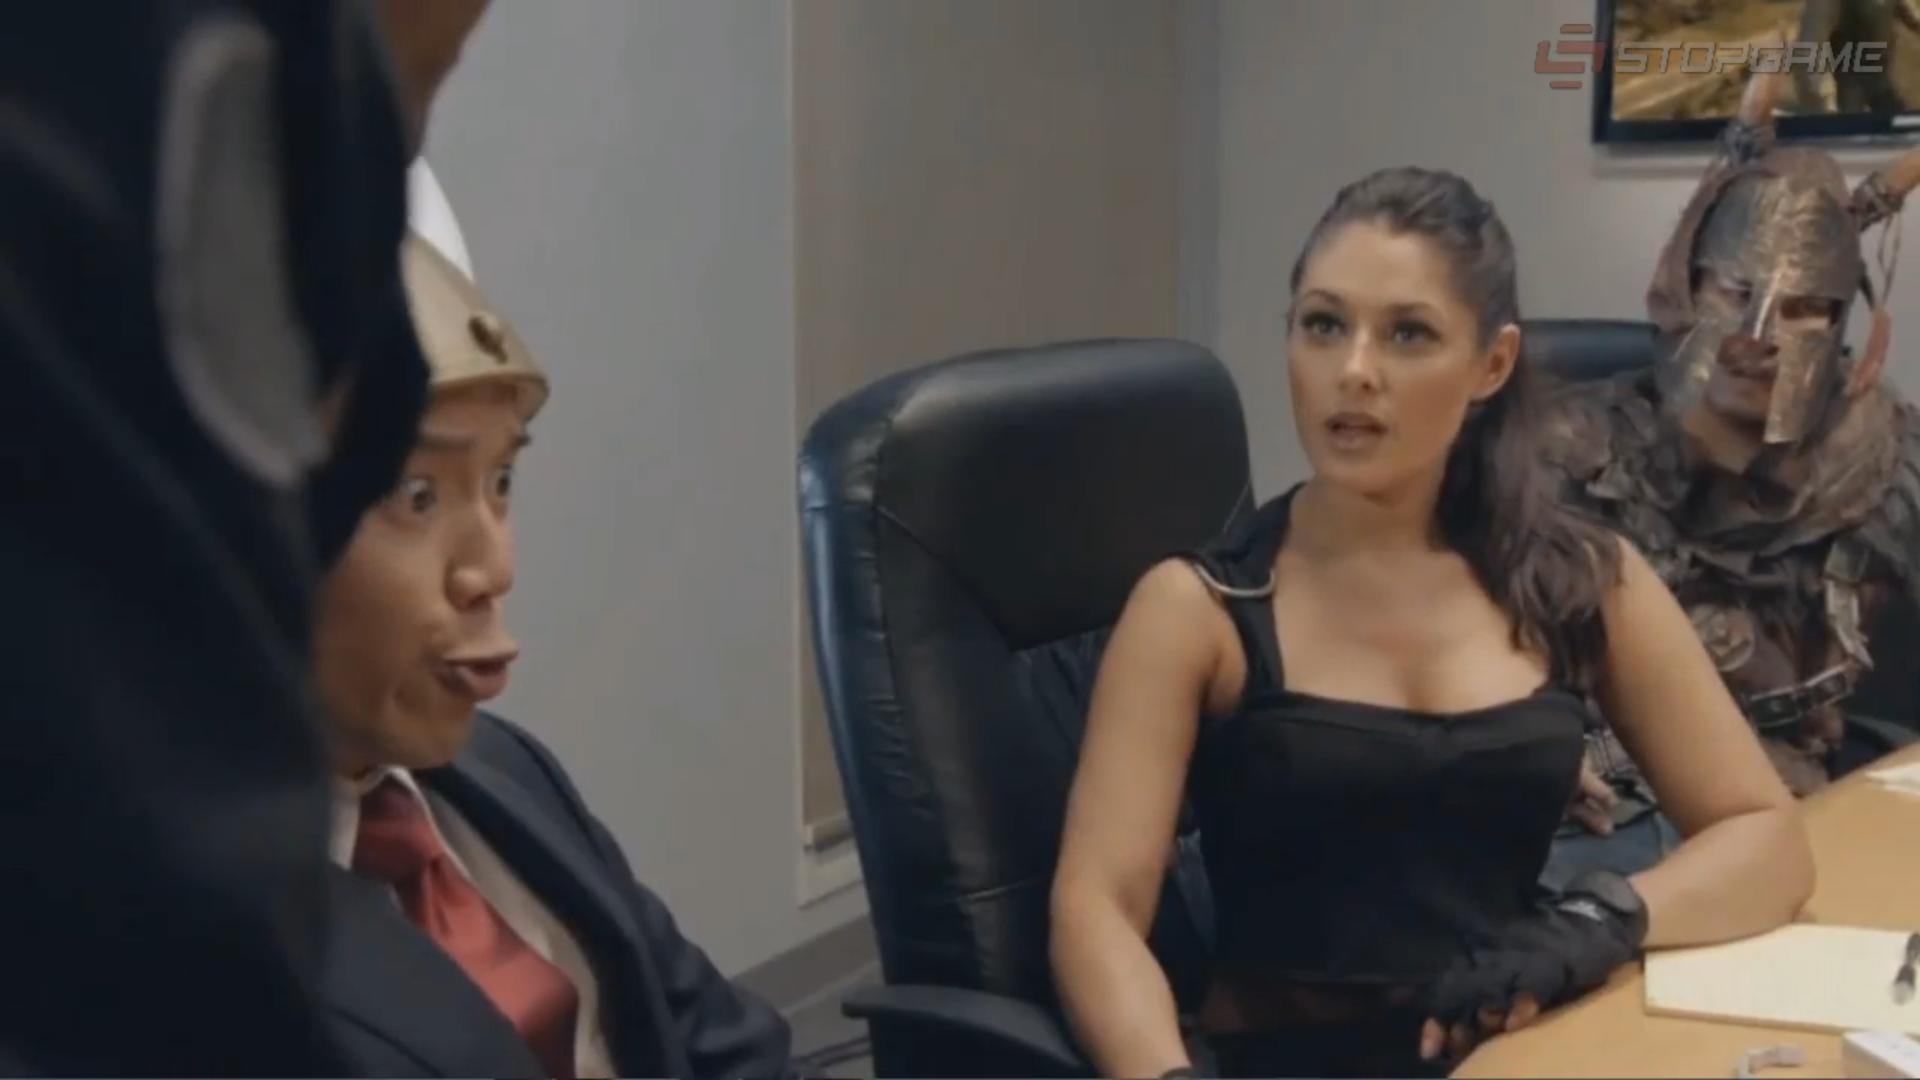 Девочка обучает мальчика сексу видео